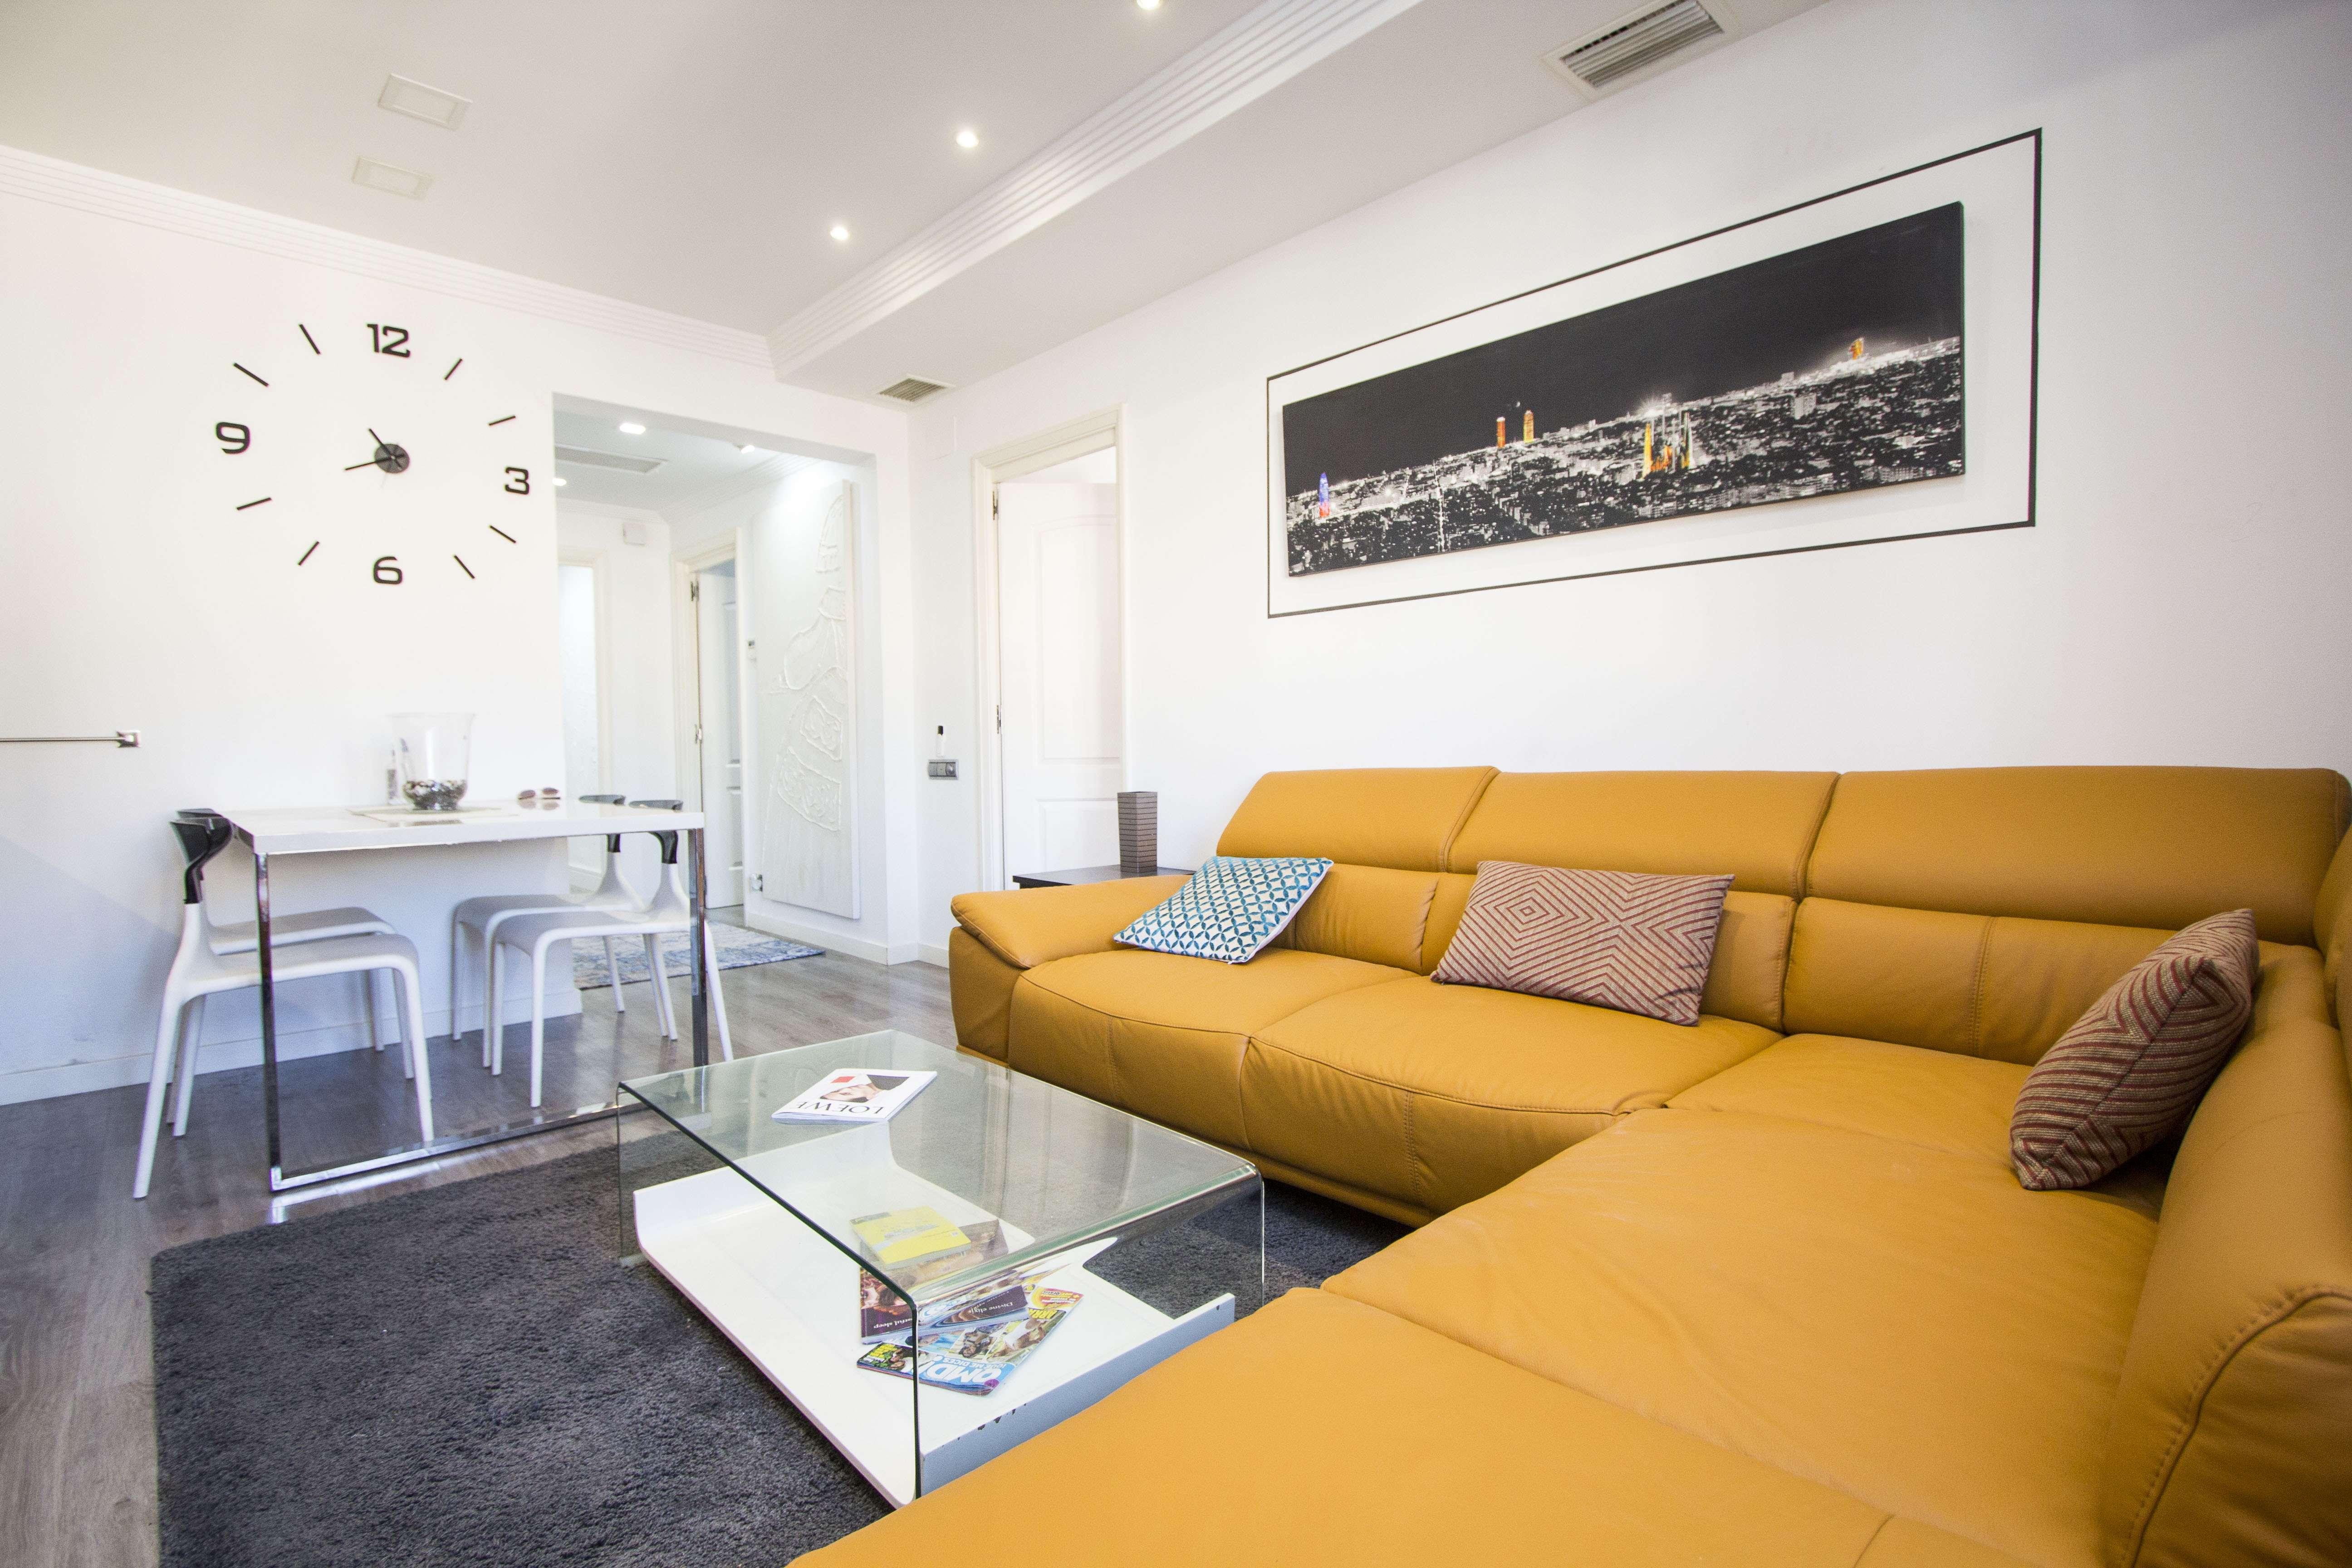 Apartament in a  minute from Passeig de Gracia